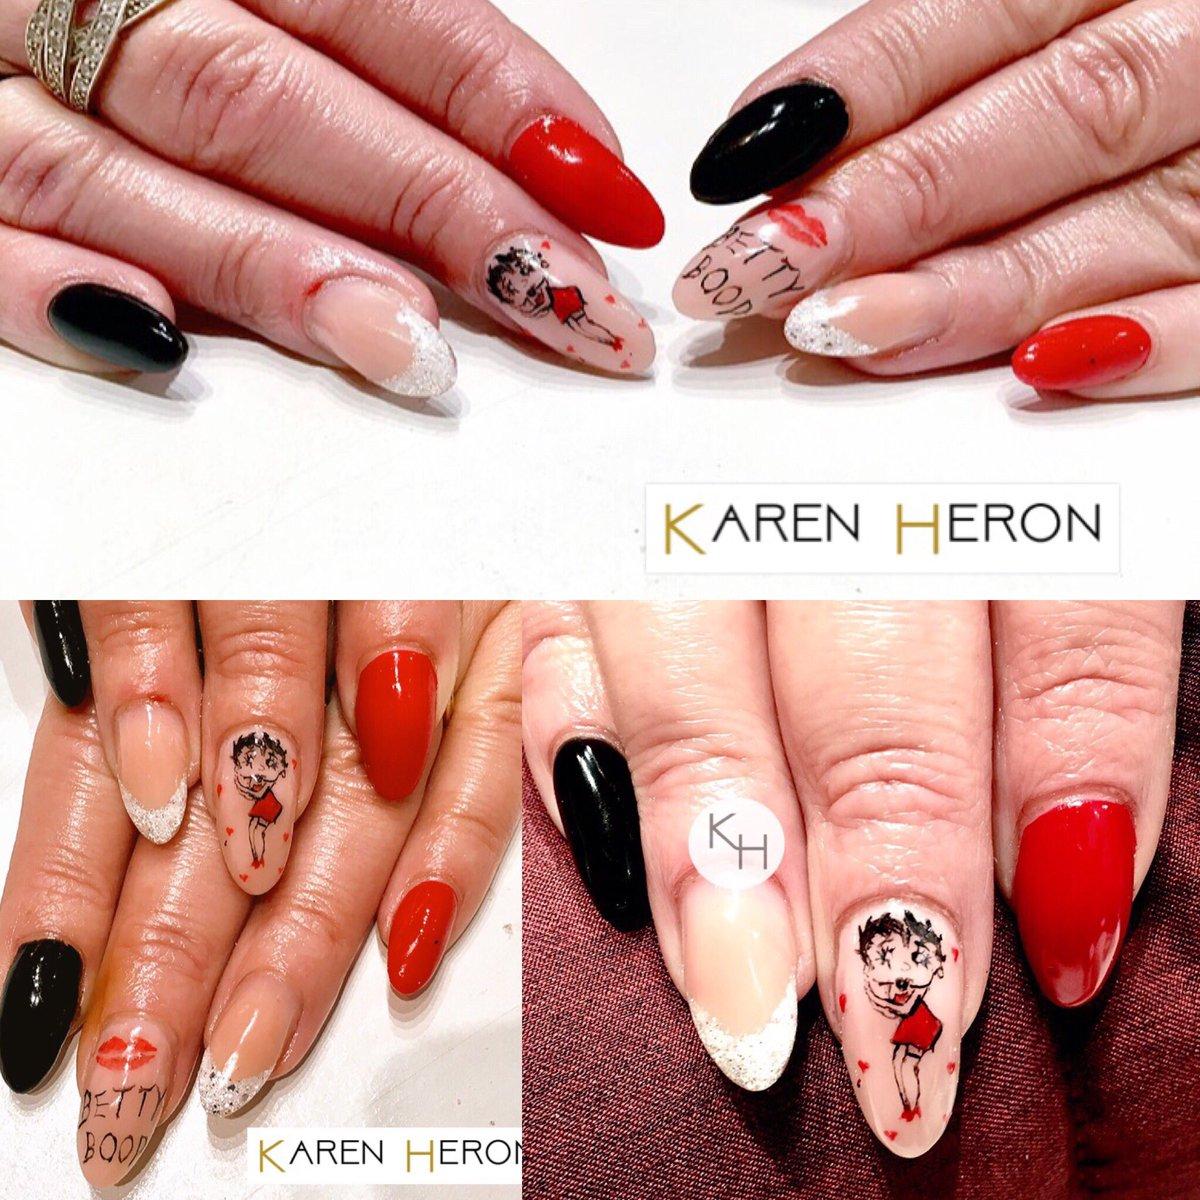 Karen Heron Beauty On Twitter Betty Boop Nails Free Hand Nail Art